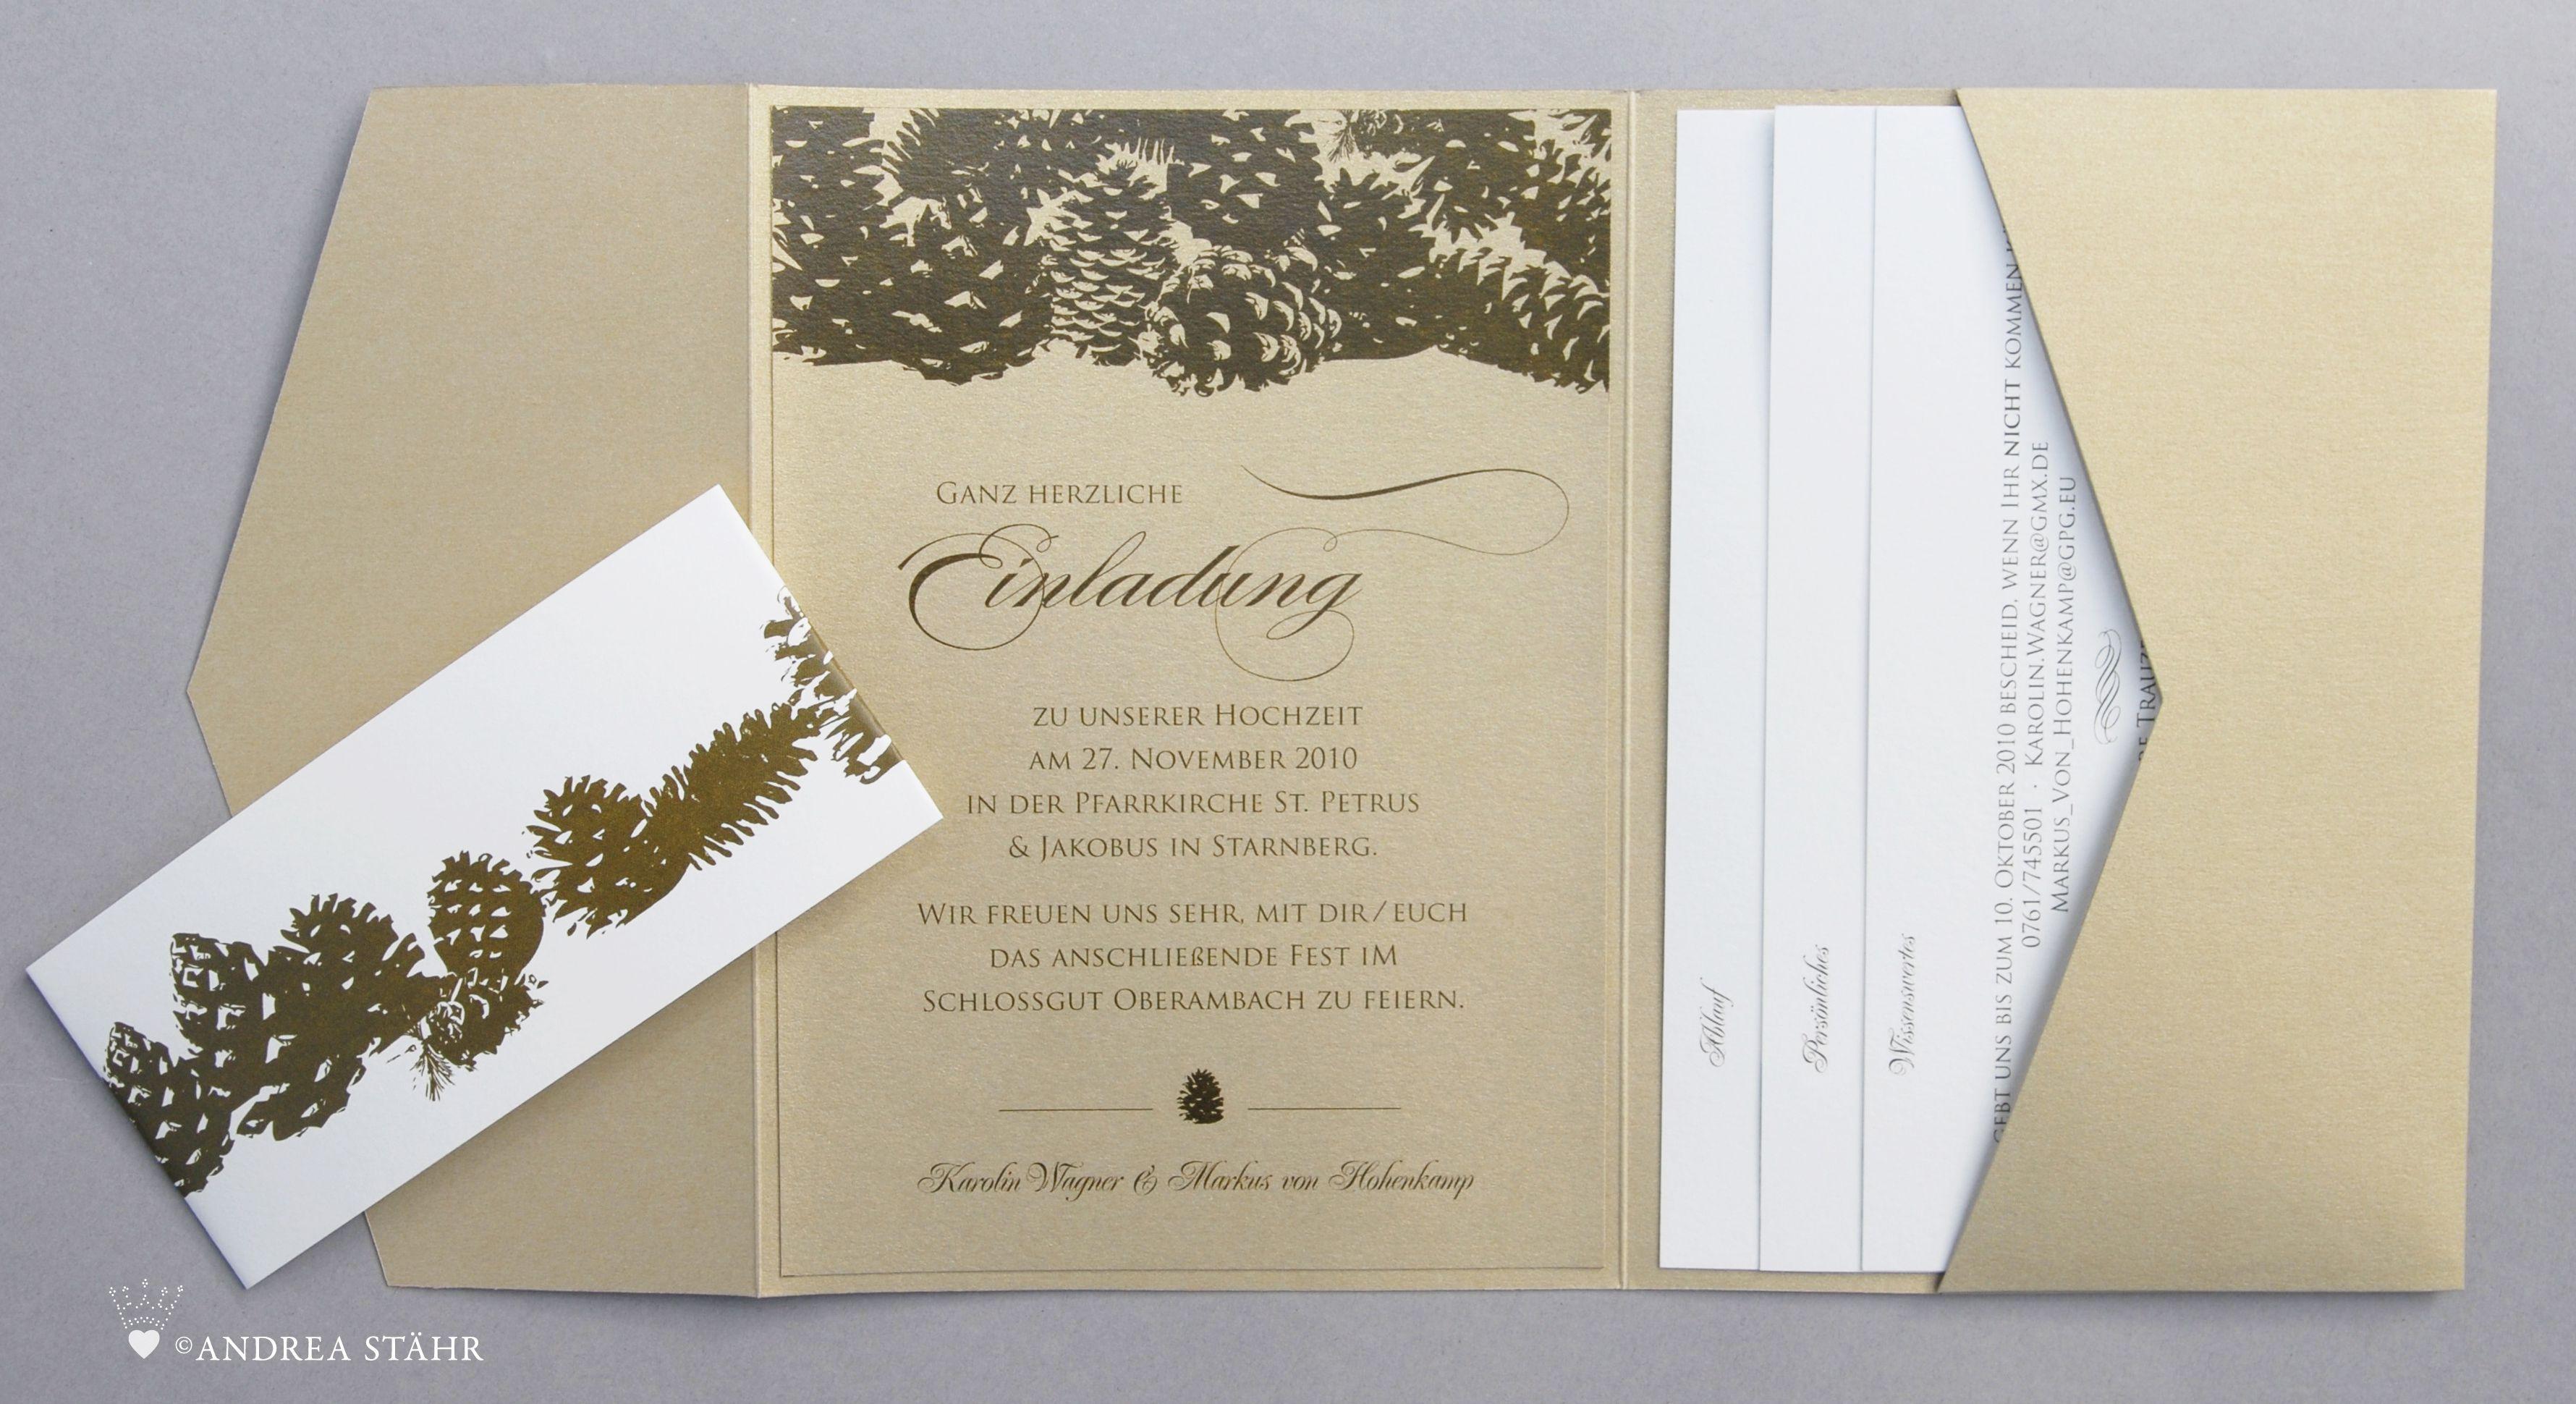 Hochzeit Dankeskarten Text : Dankeskarten Hochzeit Text Bayerisch    Danksagung Karten   Danksagung Karten